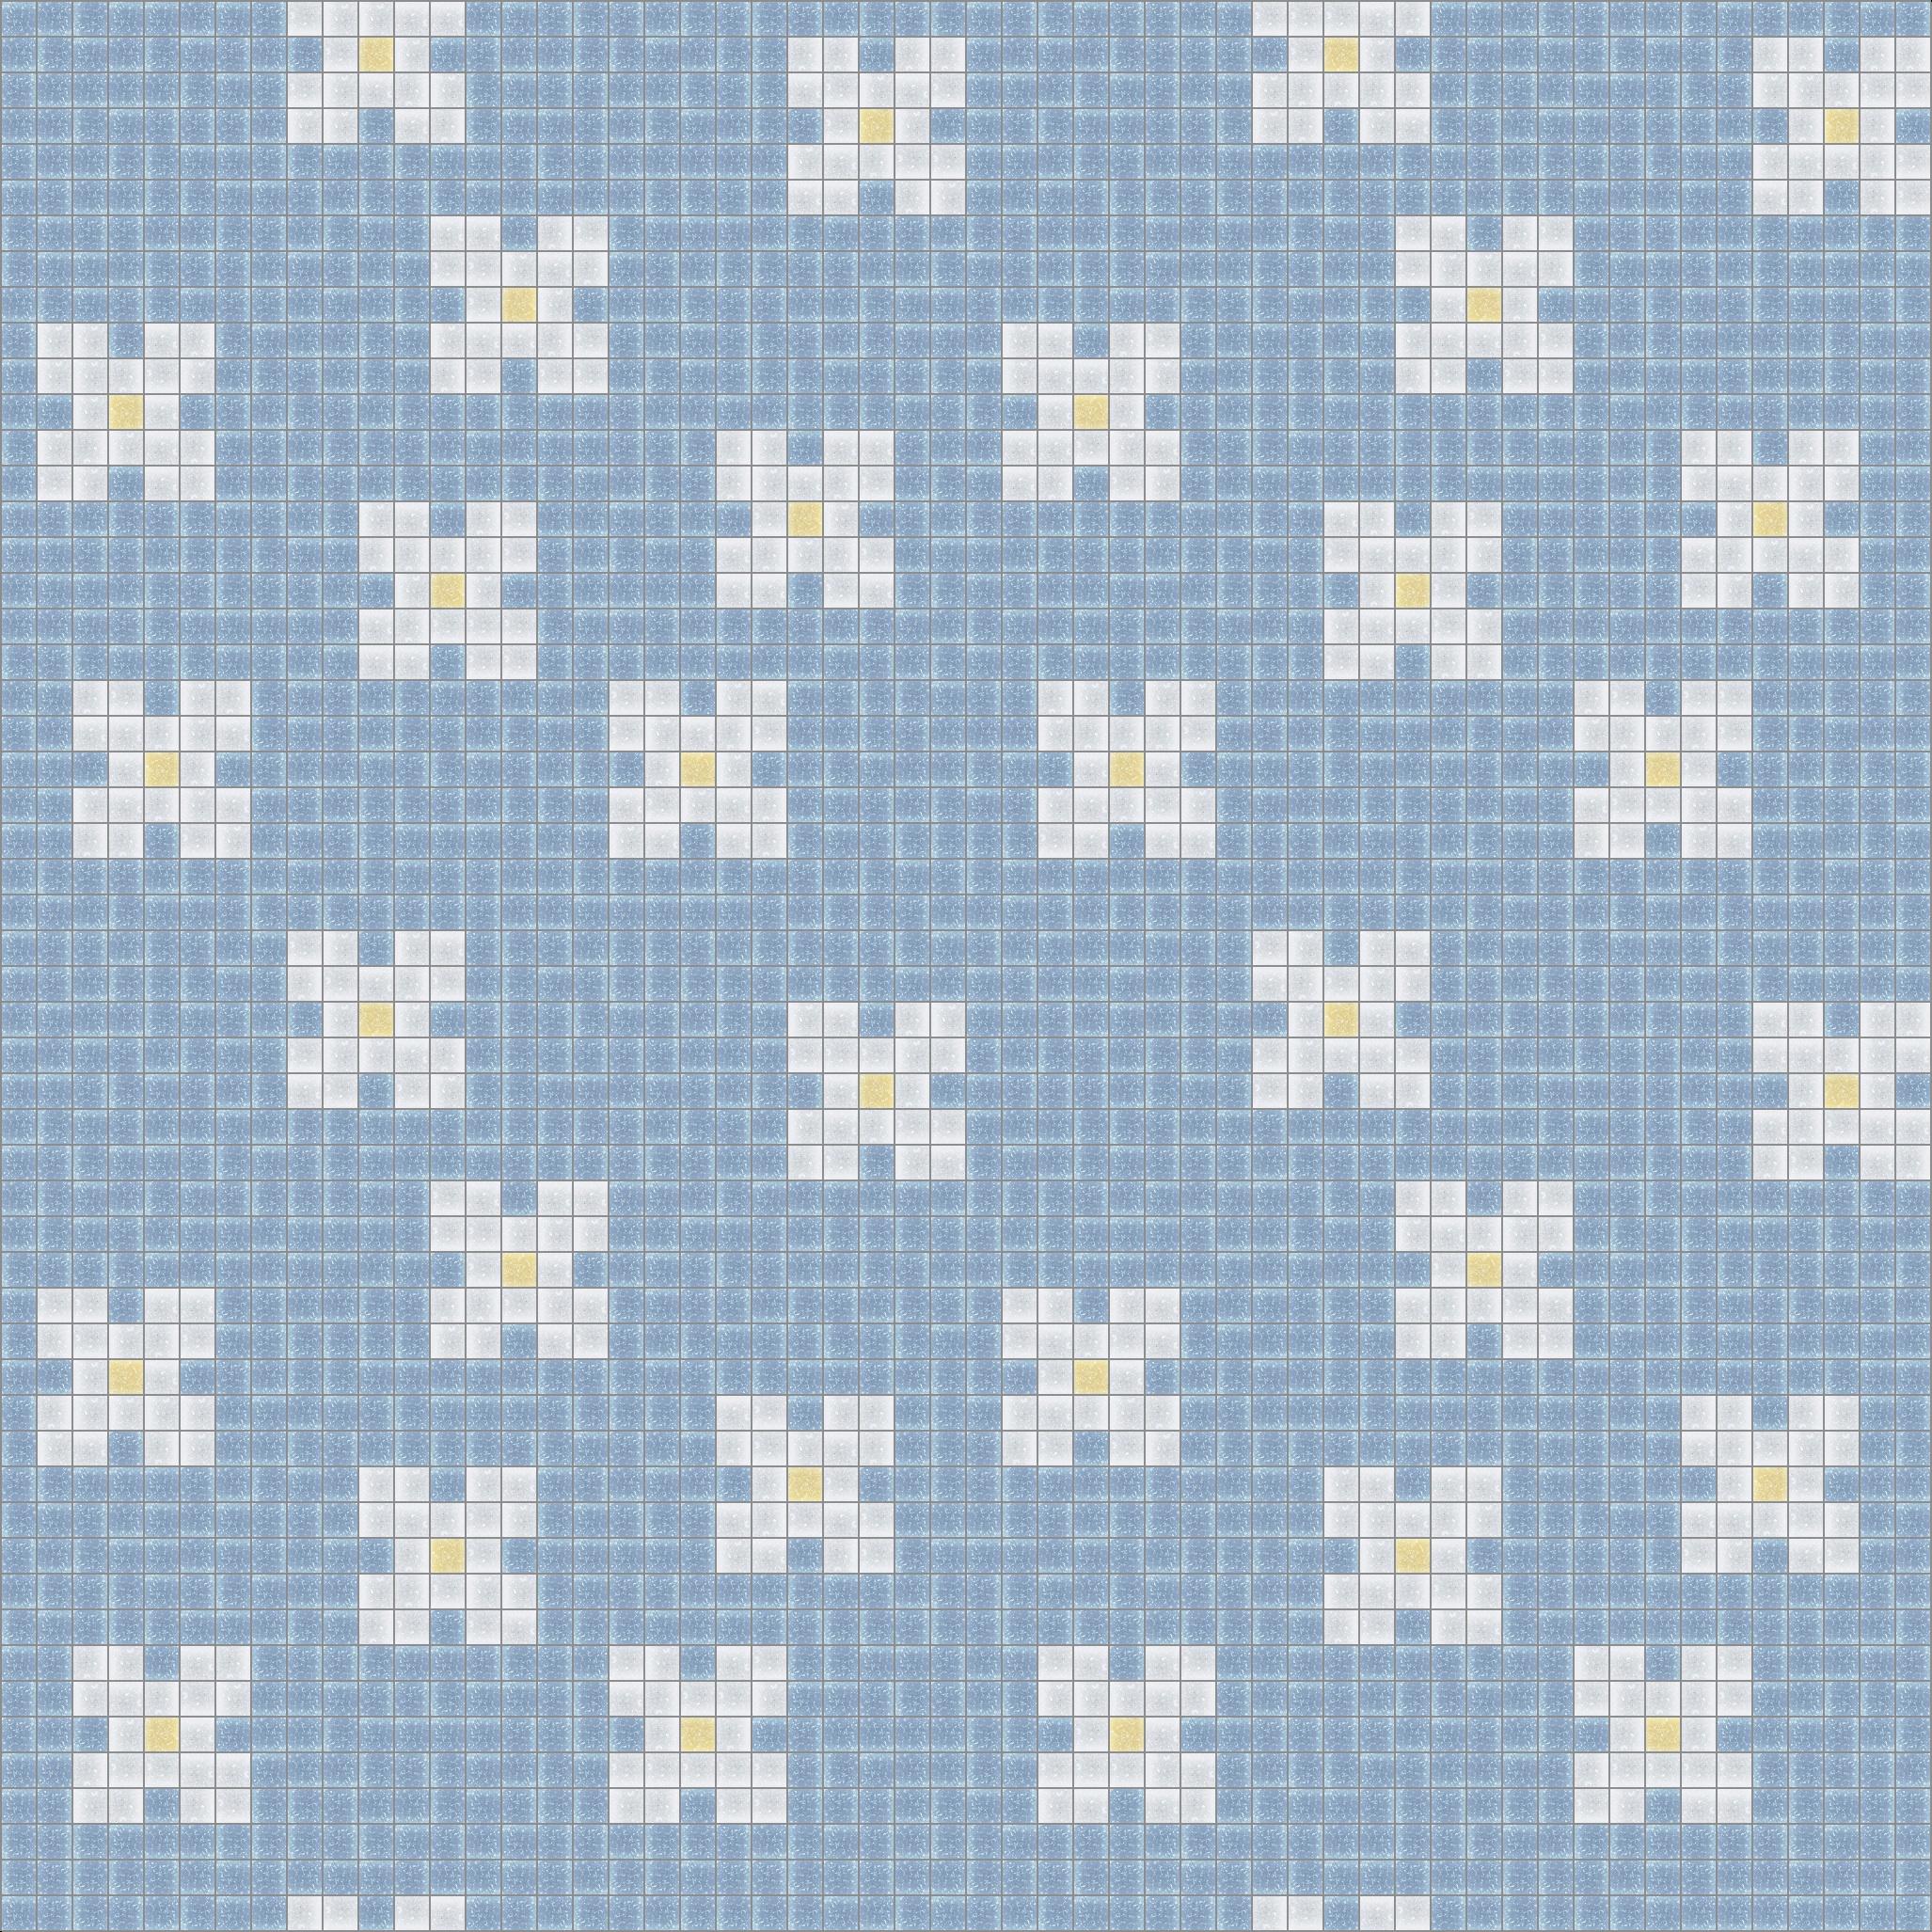 Traditional Bloom Mosaic Tile Pattern | Modern Design | Mosaic Loft ...